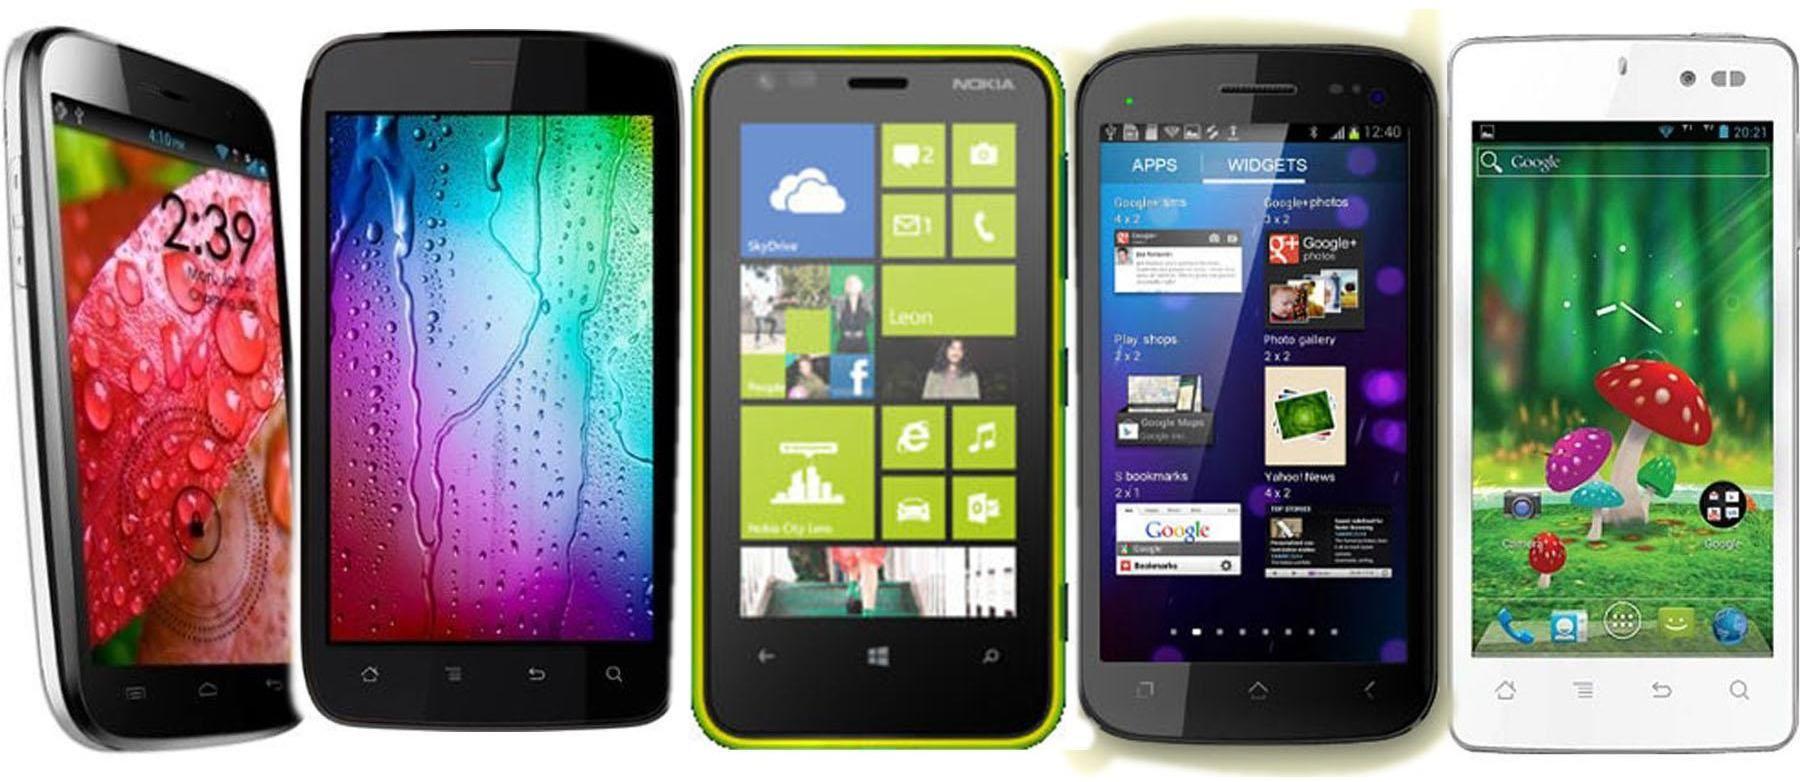 Top 5 Upcoming Smartphones And Tablets Of 2014 Smartphone Best Smartphone Phone